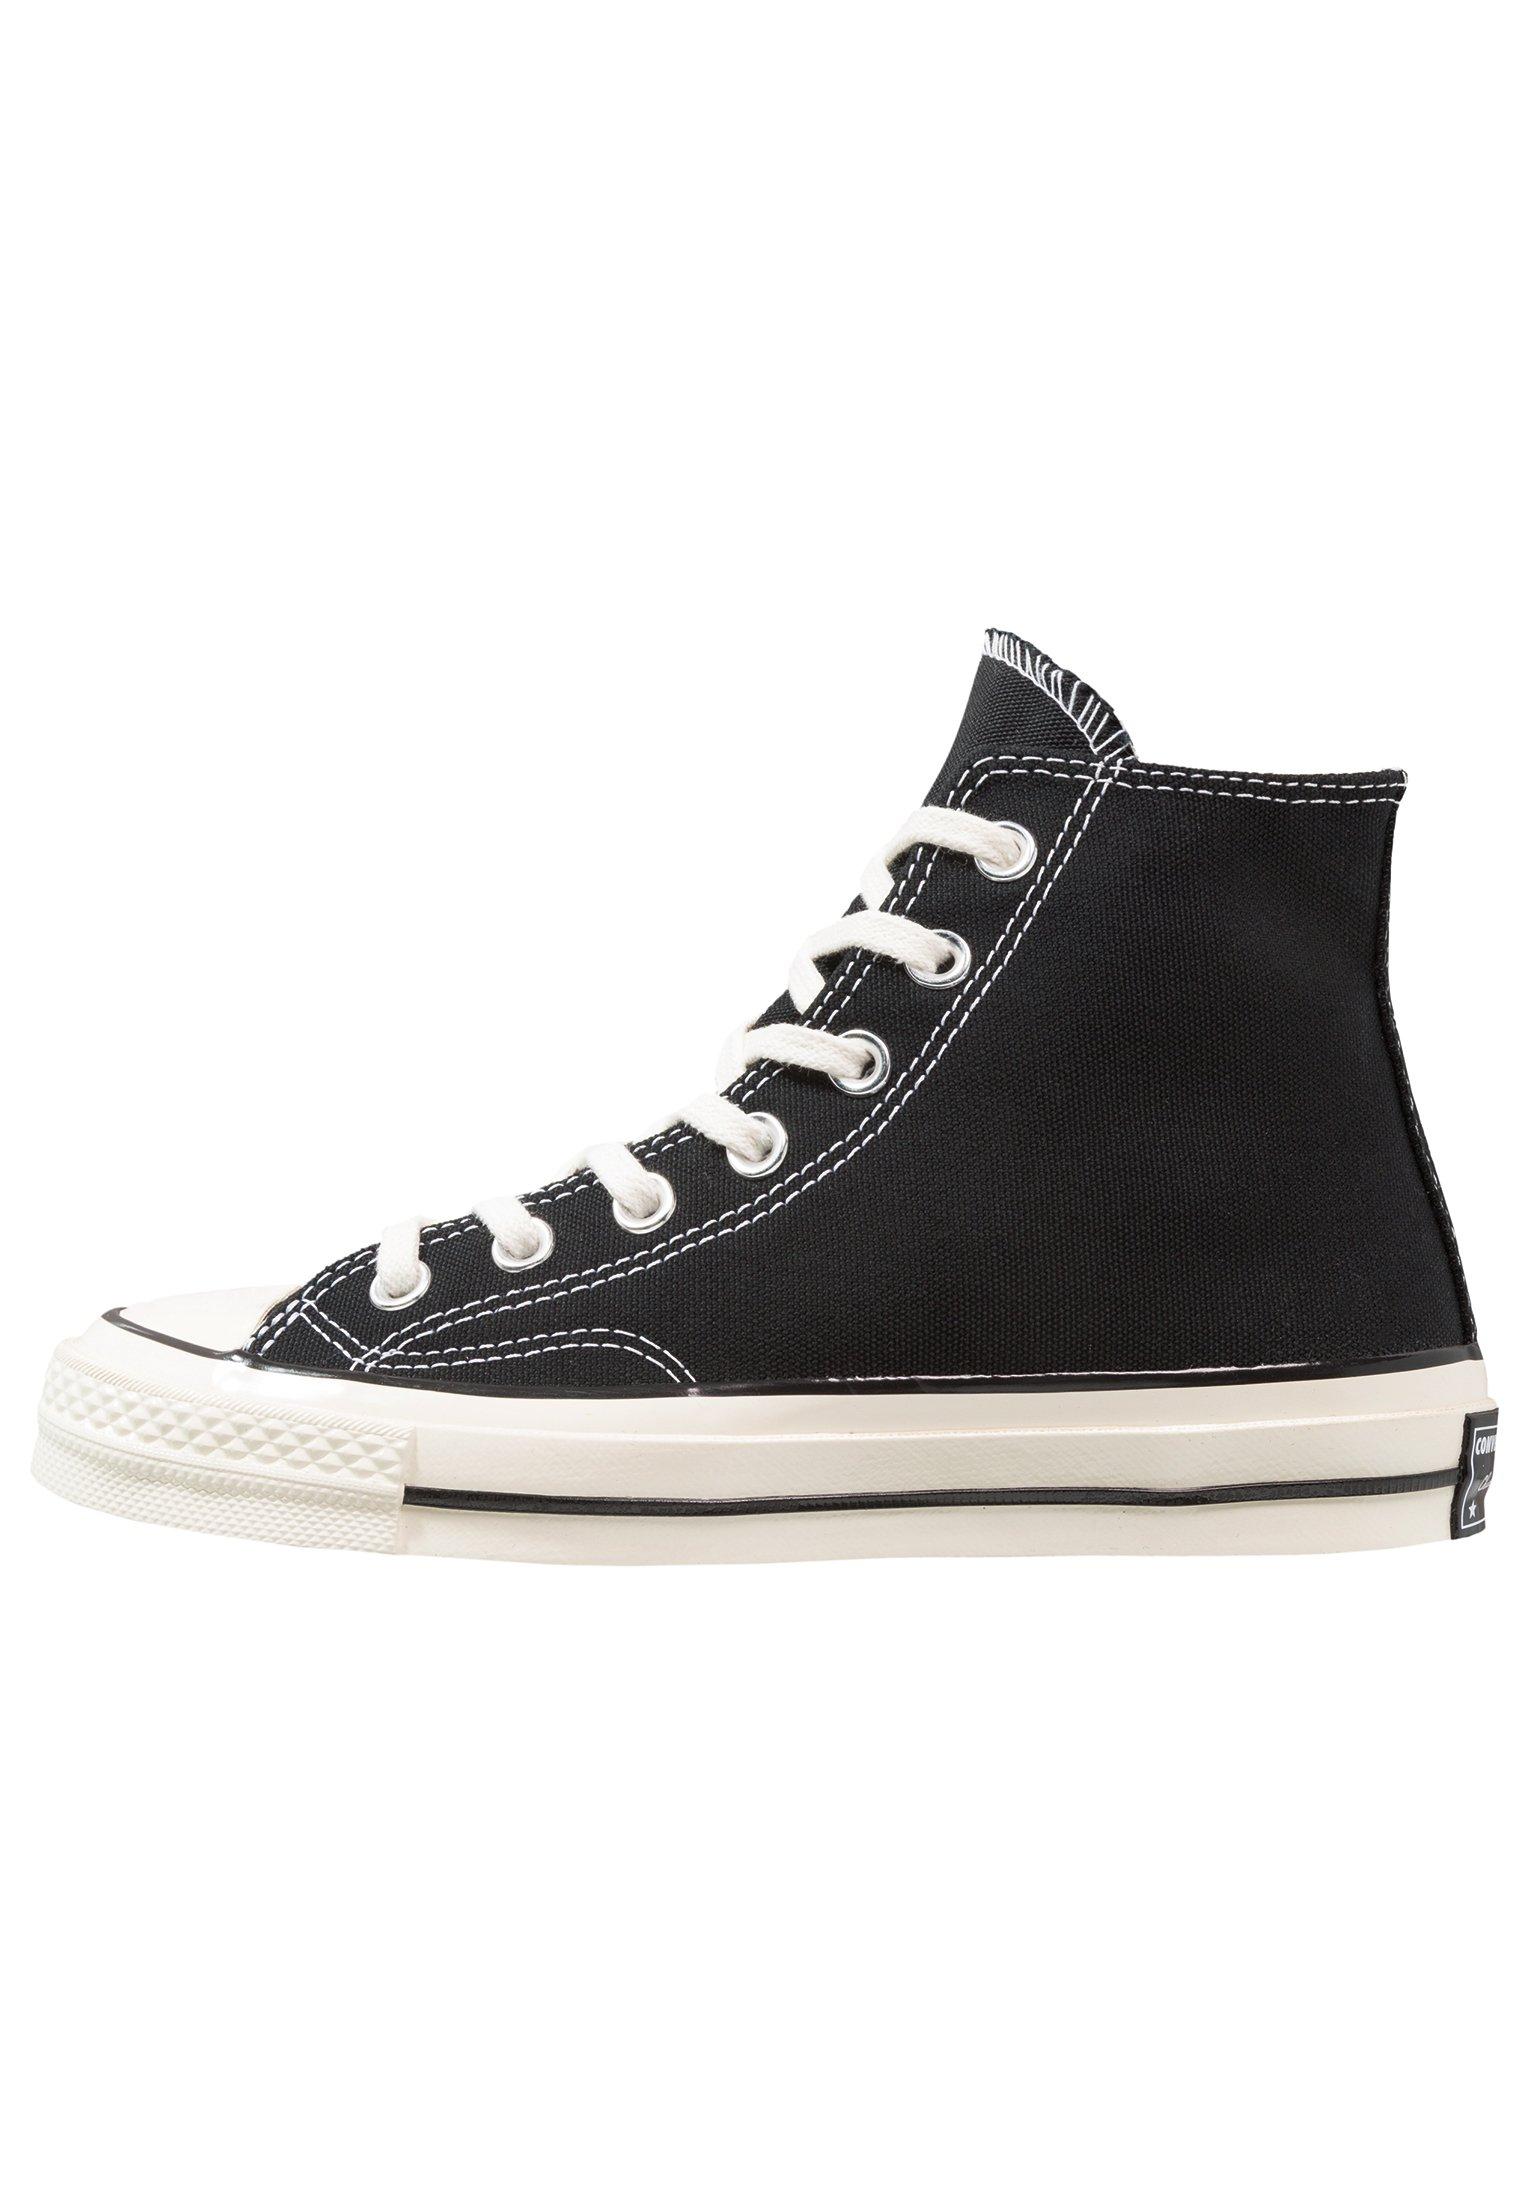 CHUCK TAYLOR ALL STAR 70 HI Sneakers alte black